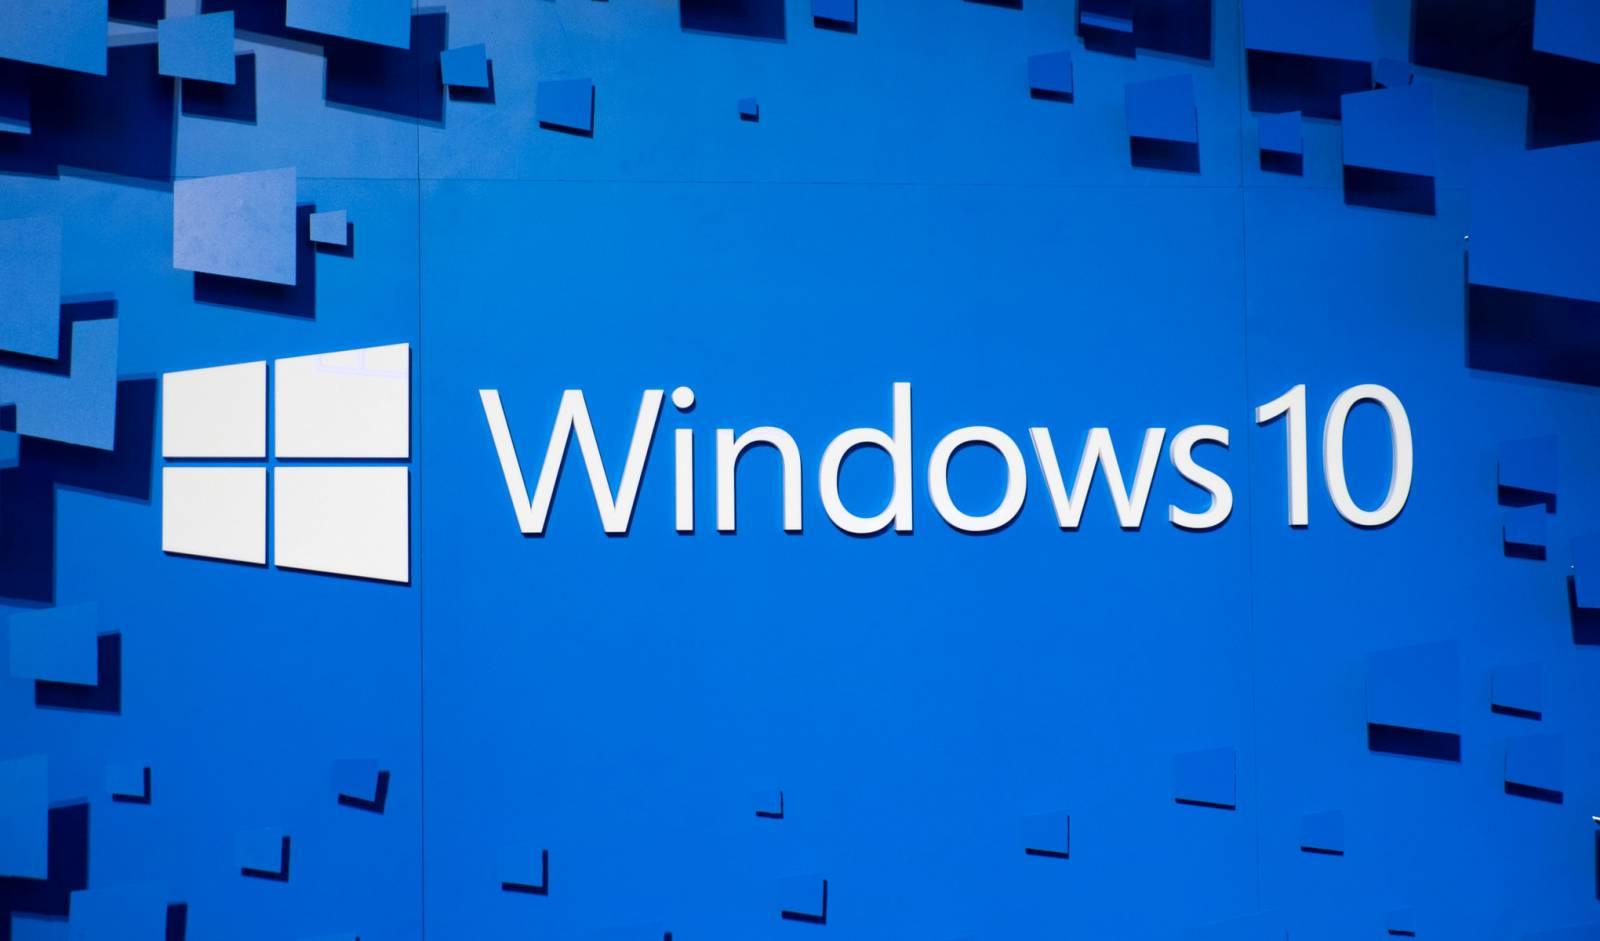 Windows 10 light